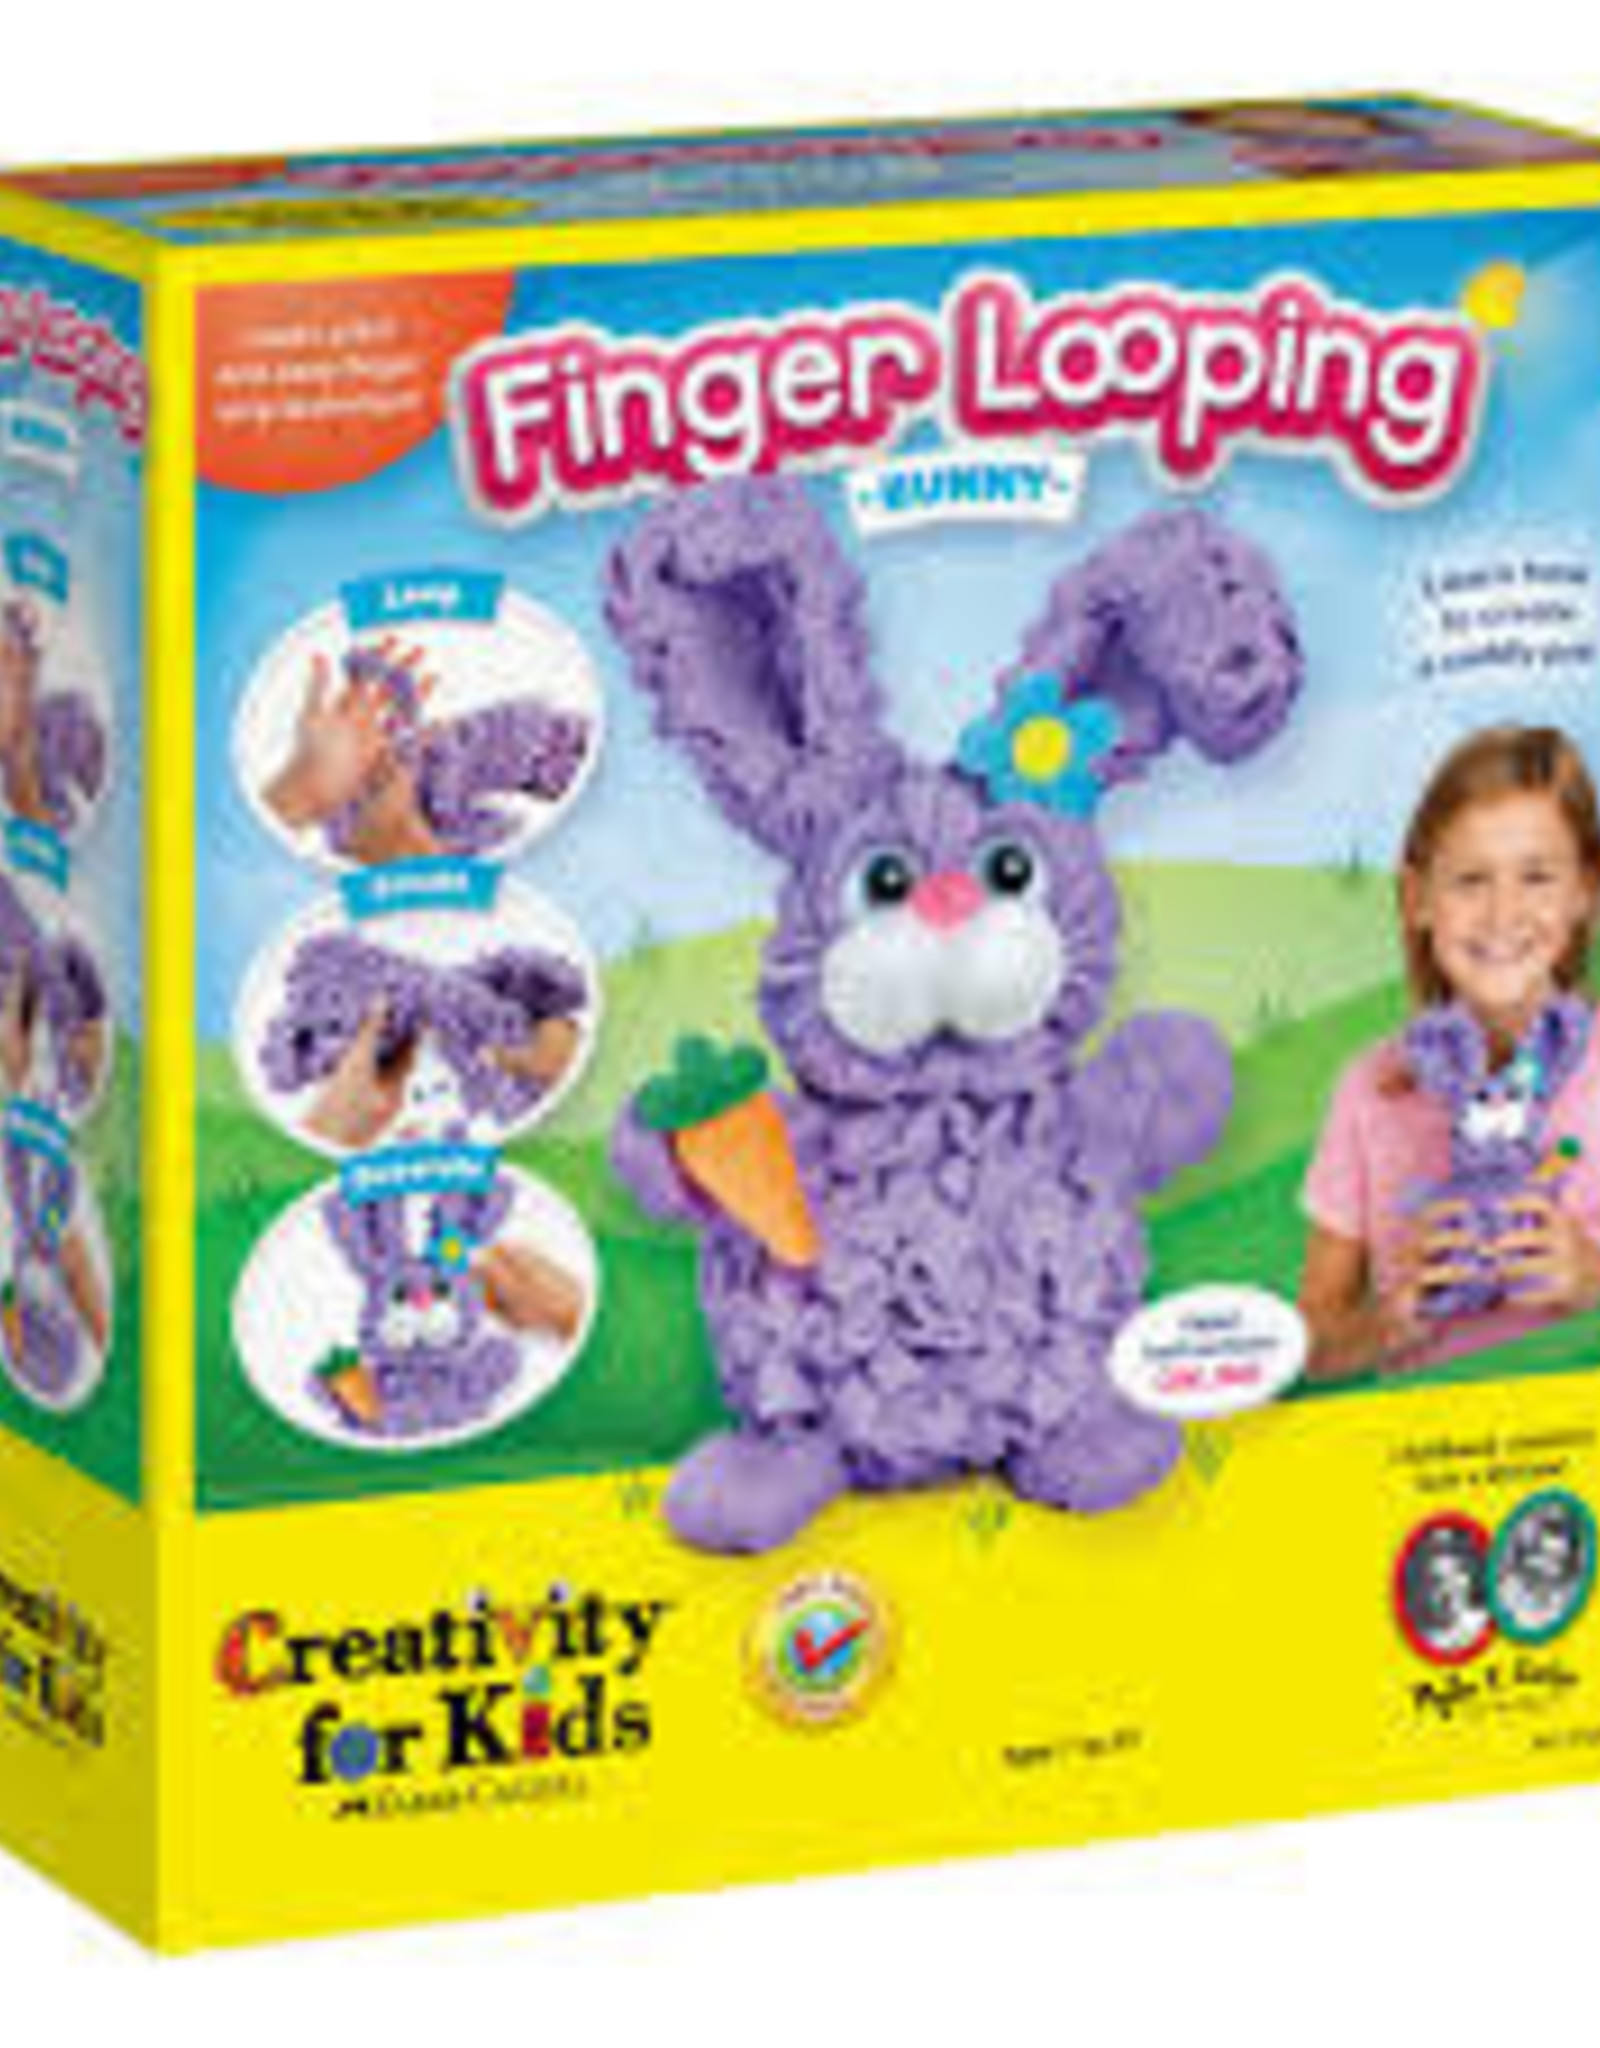 Creativity For Kids Finger Looping Bunny